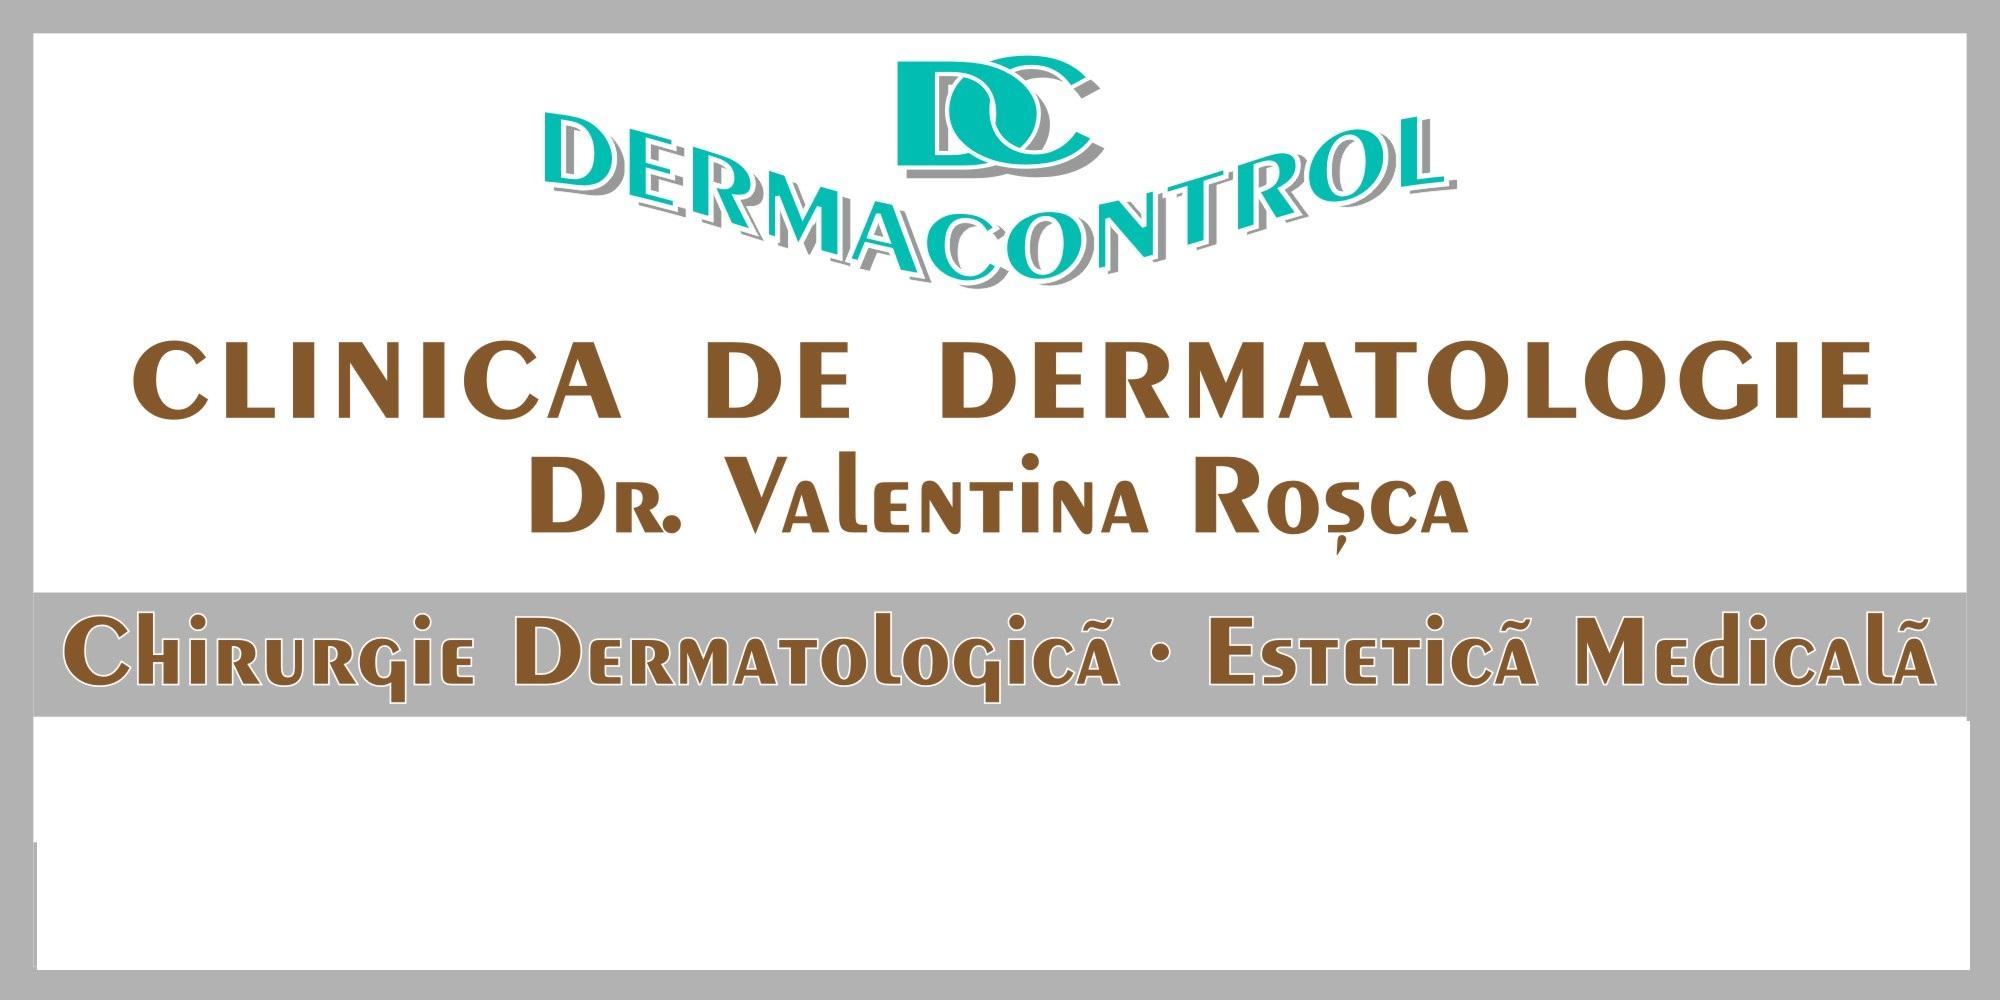 Clinica de Dermatologie Valentina Rosca